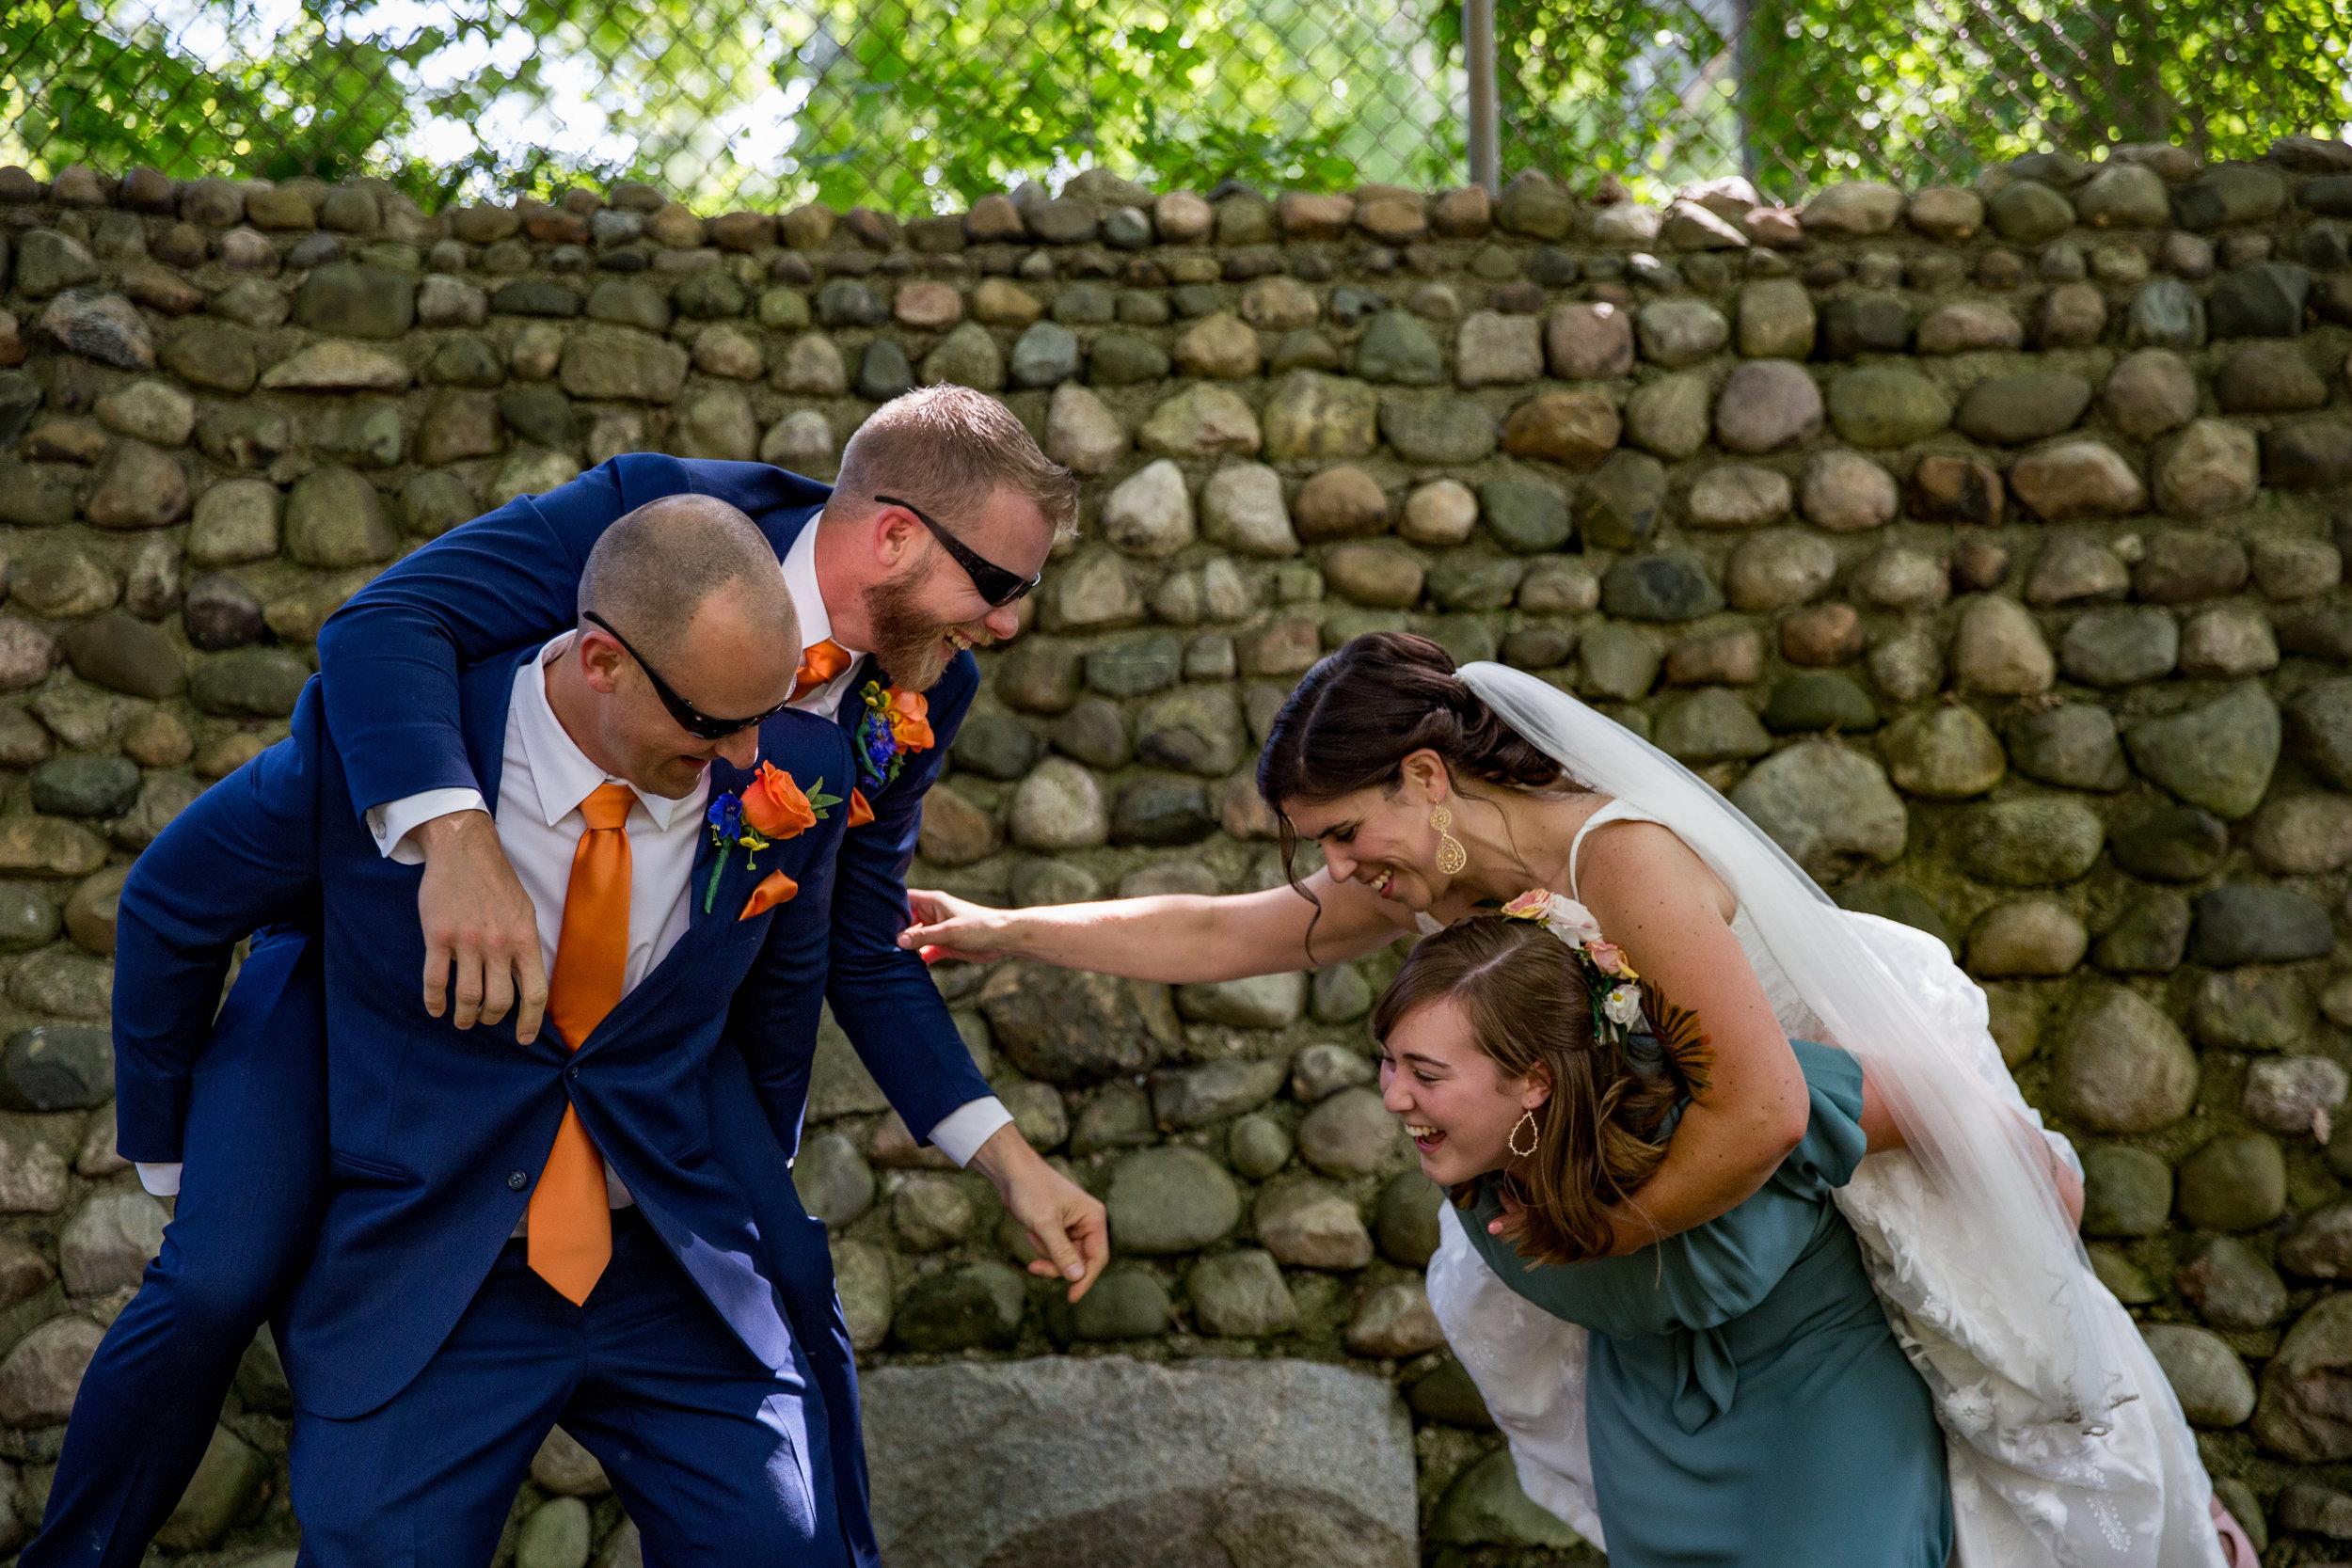 Natalie and Dallas Mooney Wedding 6-8-19_Tania Watt Photography-374.jpg